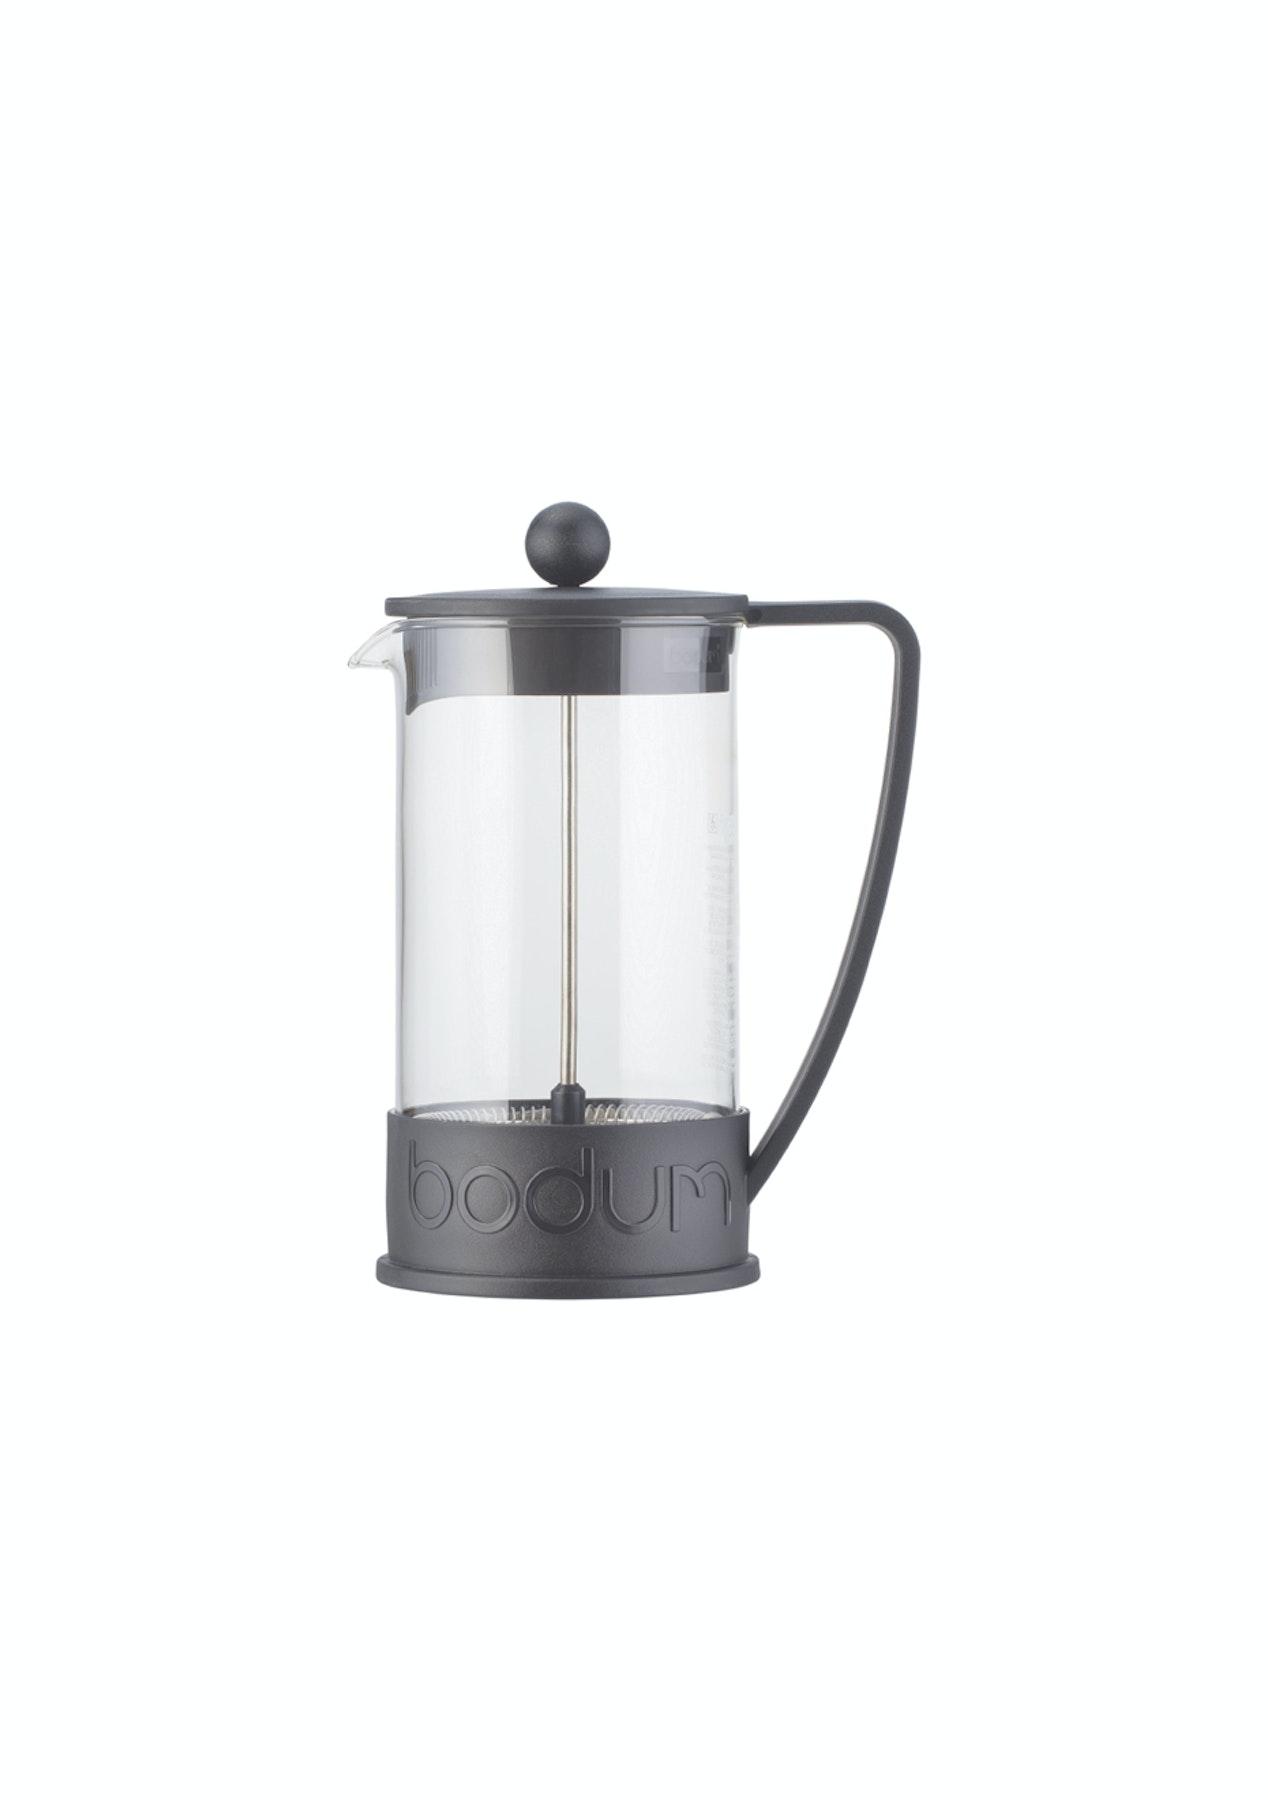 Bodum Brazil French Press Coffee Maker 3 Cup Black